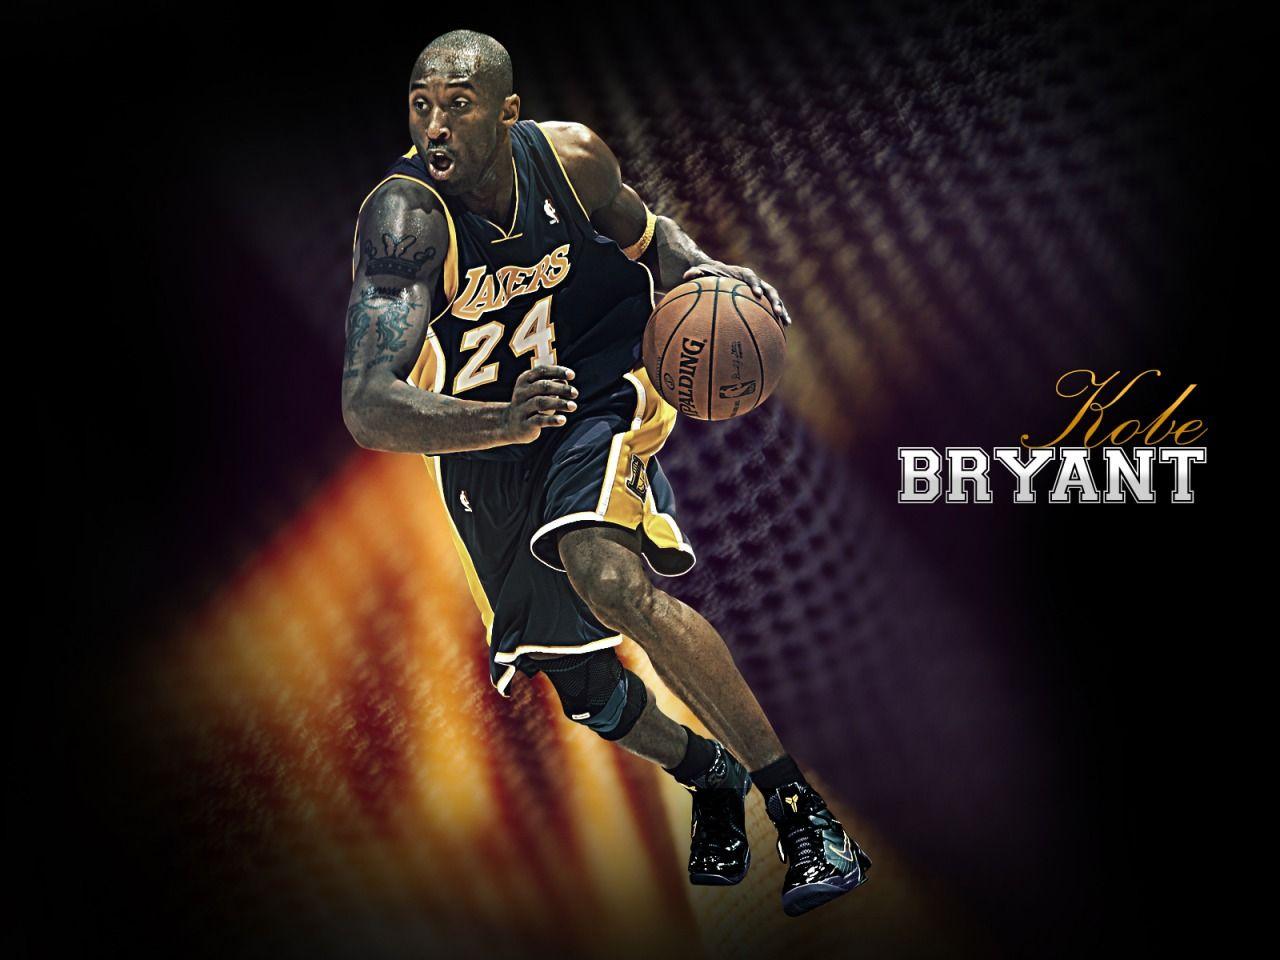 Pin By Eric Brann On Basketball Kobe Bryant Wallpaper Kobe Bryant Lakers Kobe Bryant